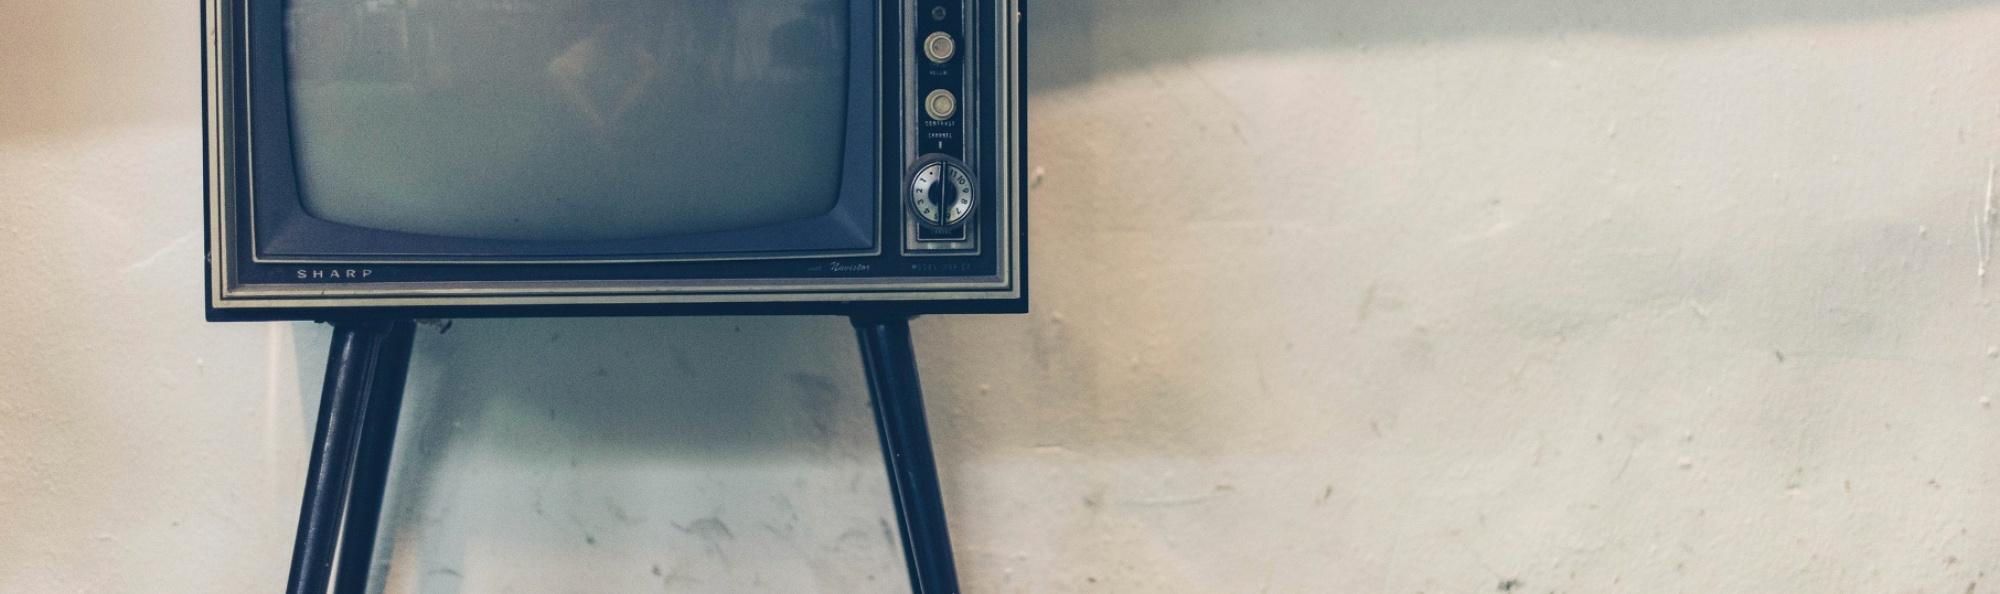 TV Advertising -